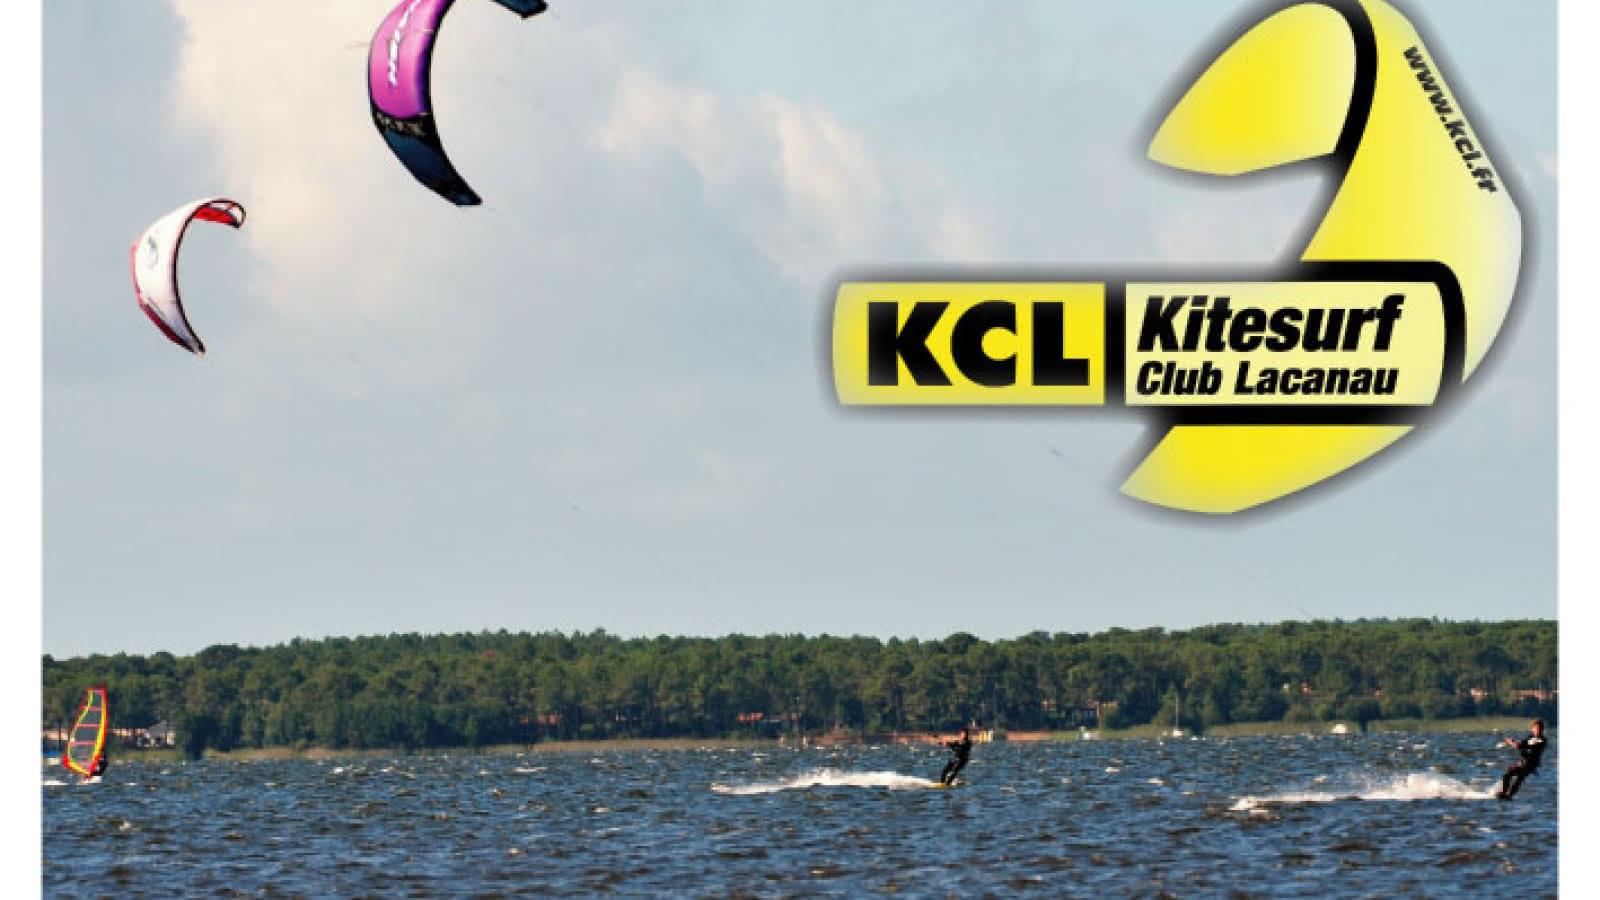 Activité nautique KiteSurf Club Lacanau  (1)